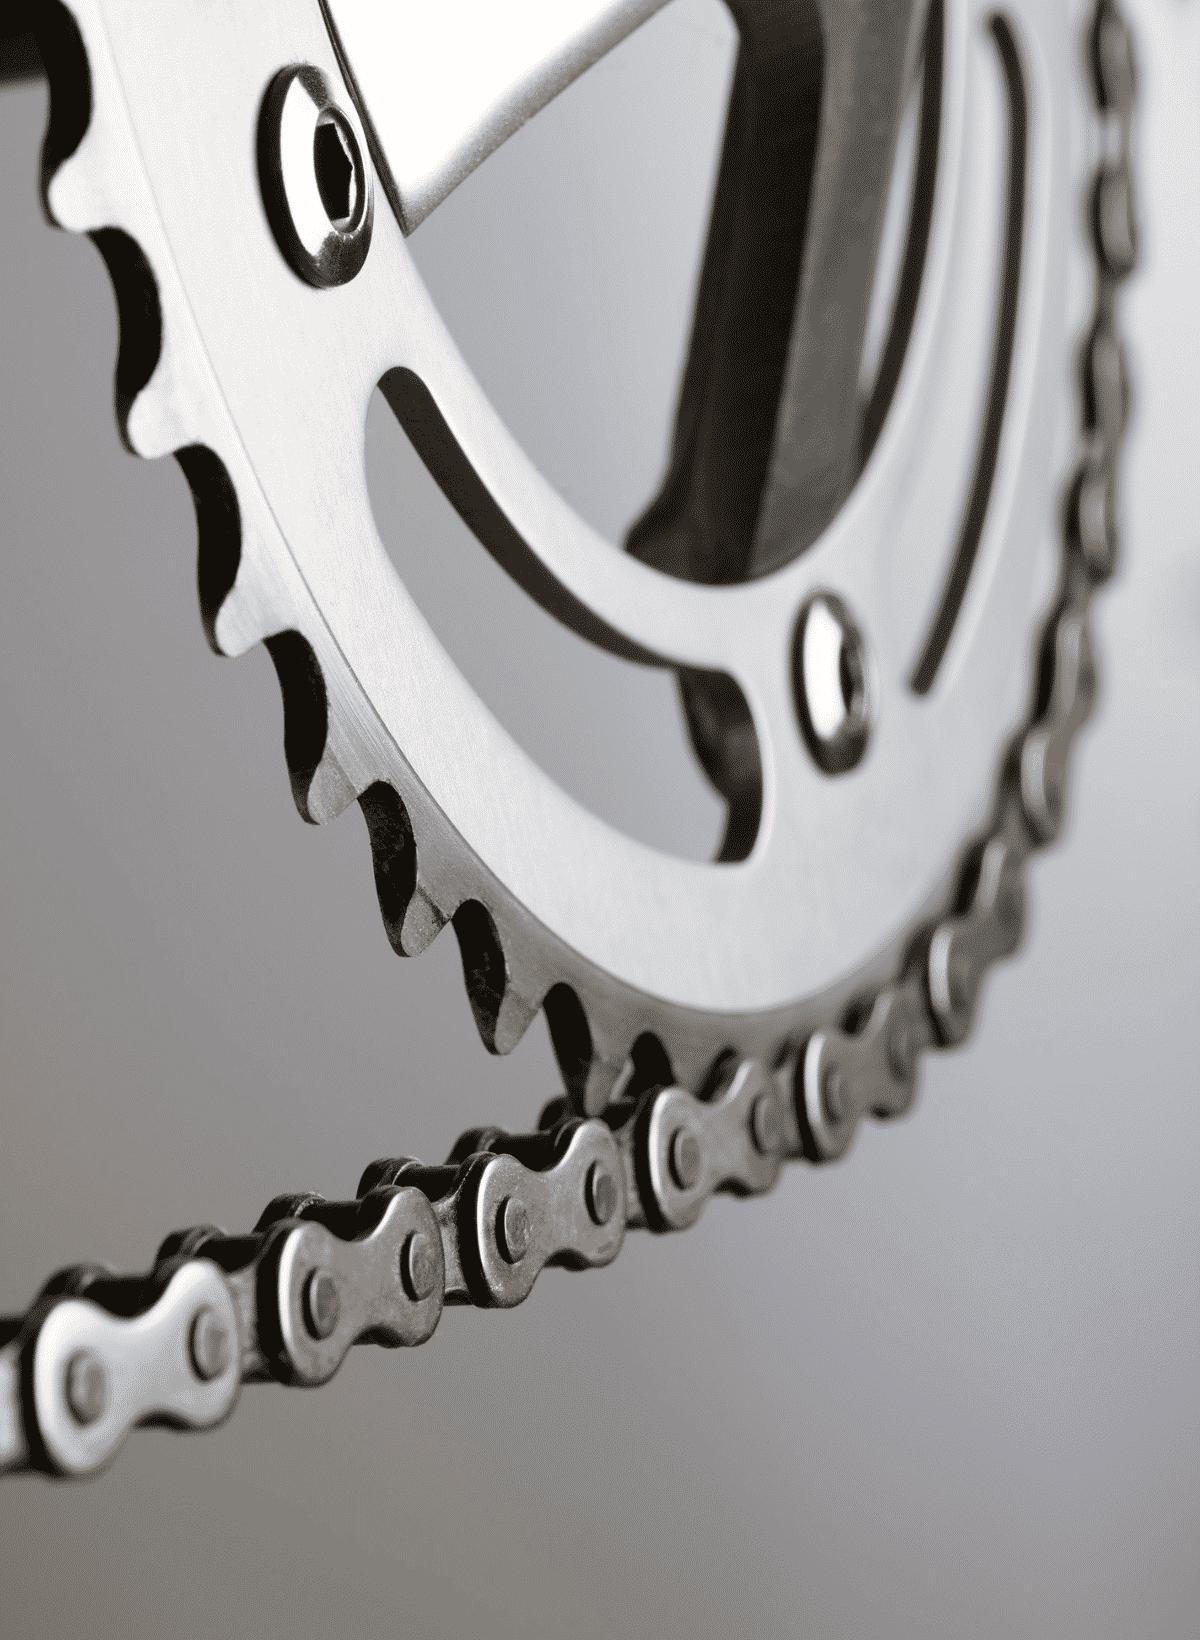 bicicleta mtb monoplato